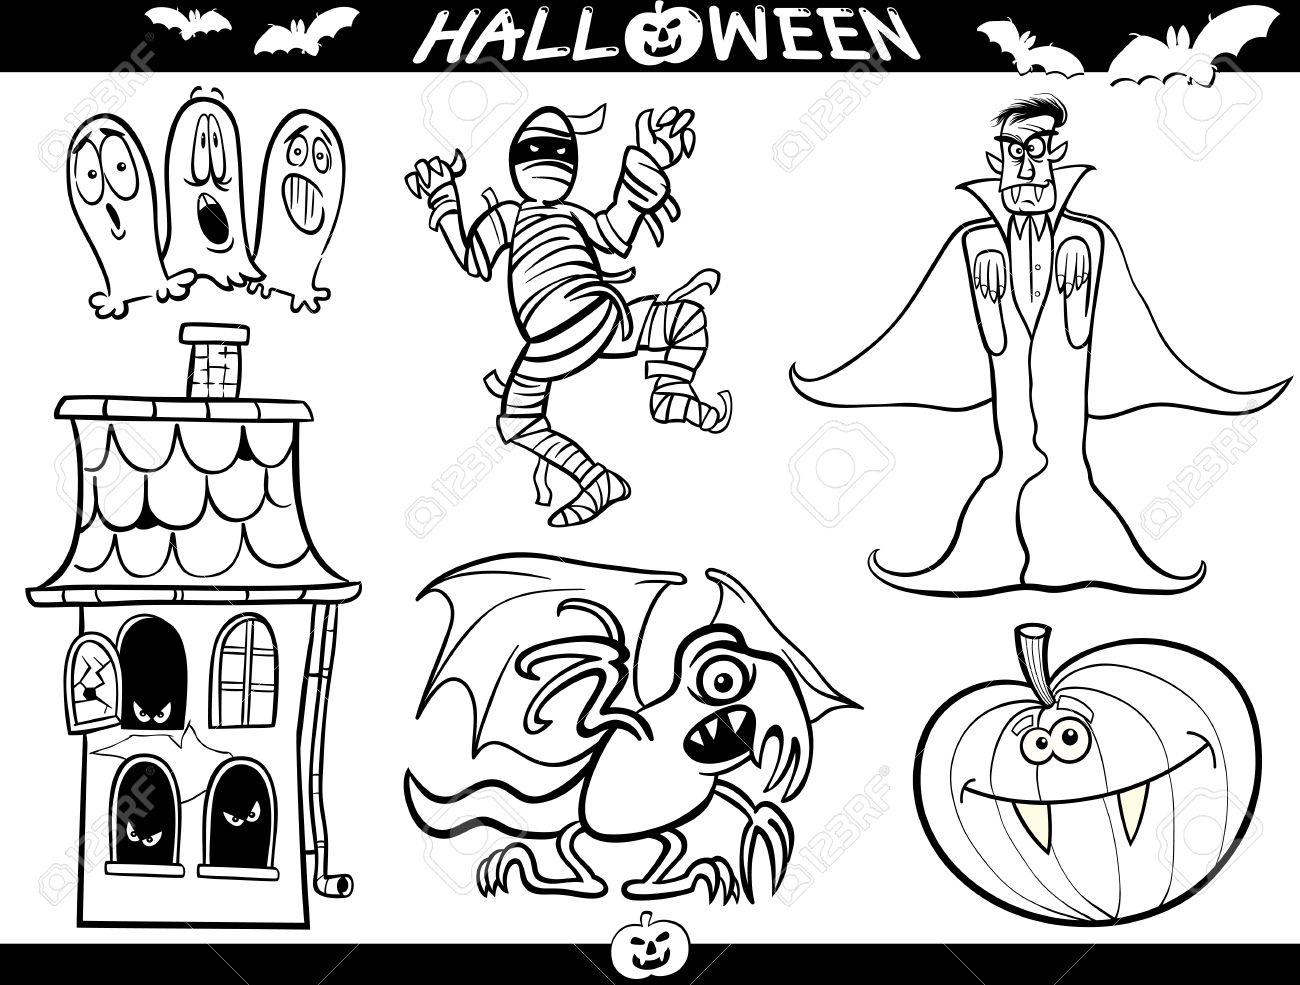 1300x985 Cartoon Illustration Of Halloween Themes, Vampire Or Count Dracula